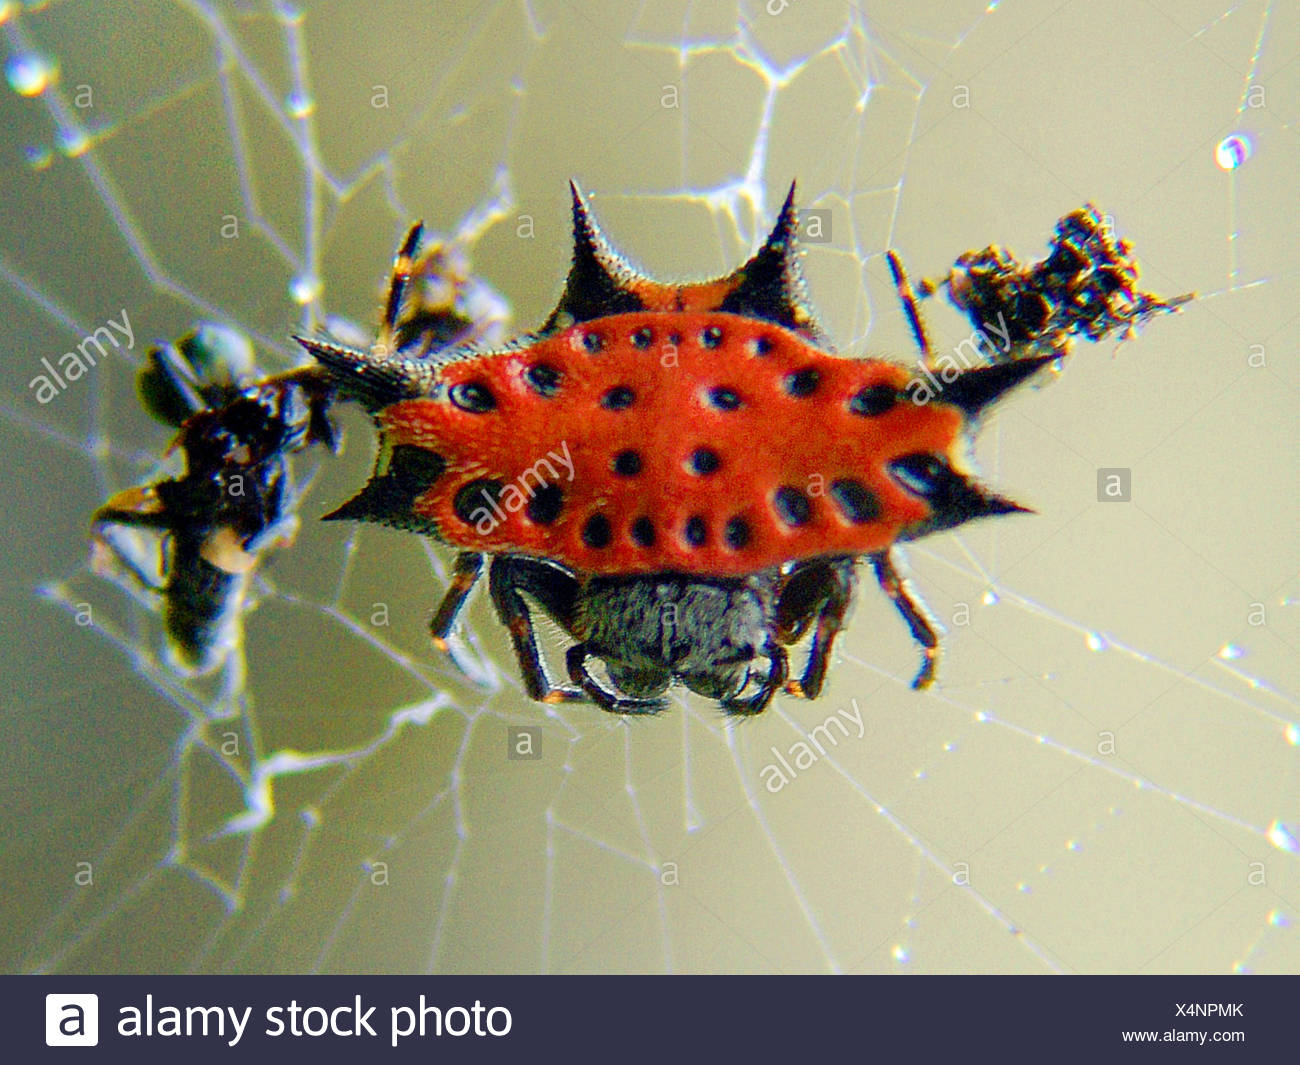 Radnetzspinne, Radnetz-Spinne, Gastercantha cancriformis (Gastercantha cancriformis), in ihrem Netz, Costa Rica | orbweb spider  - Stock Image